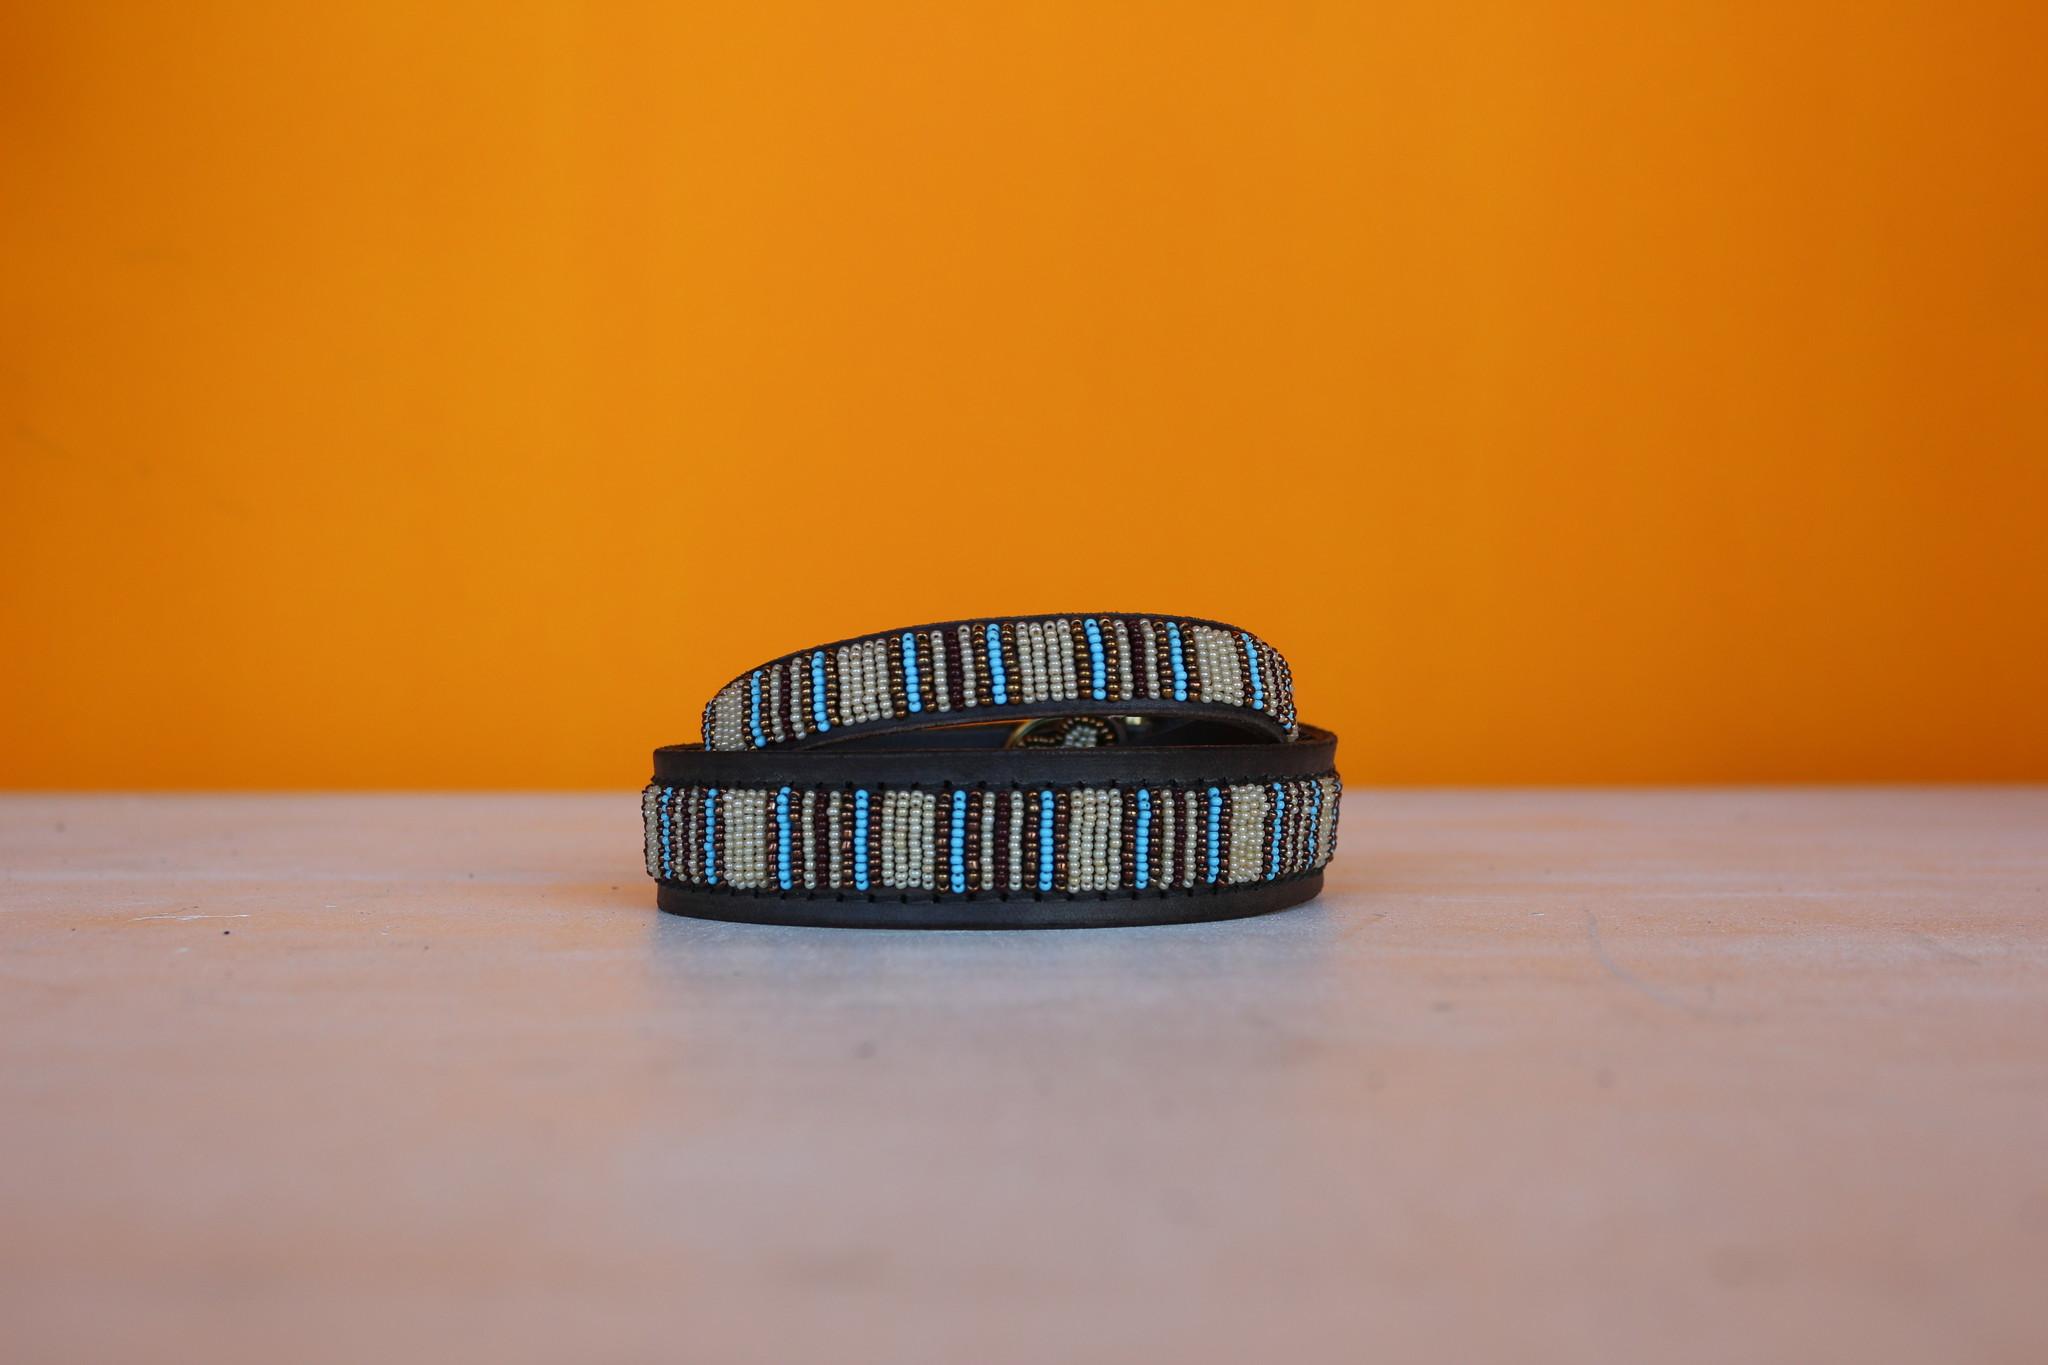 HANDMADE IN KENYA BLUE NILE DOG COLLAR